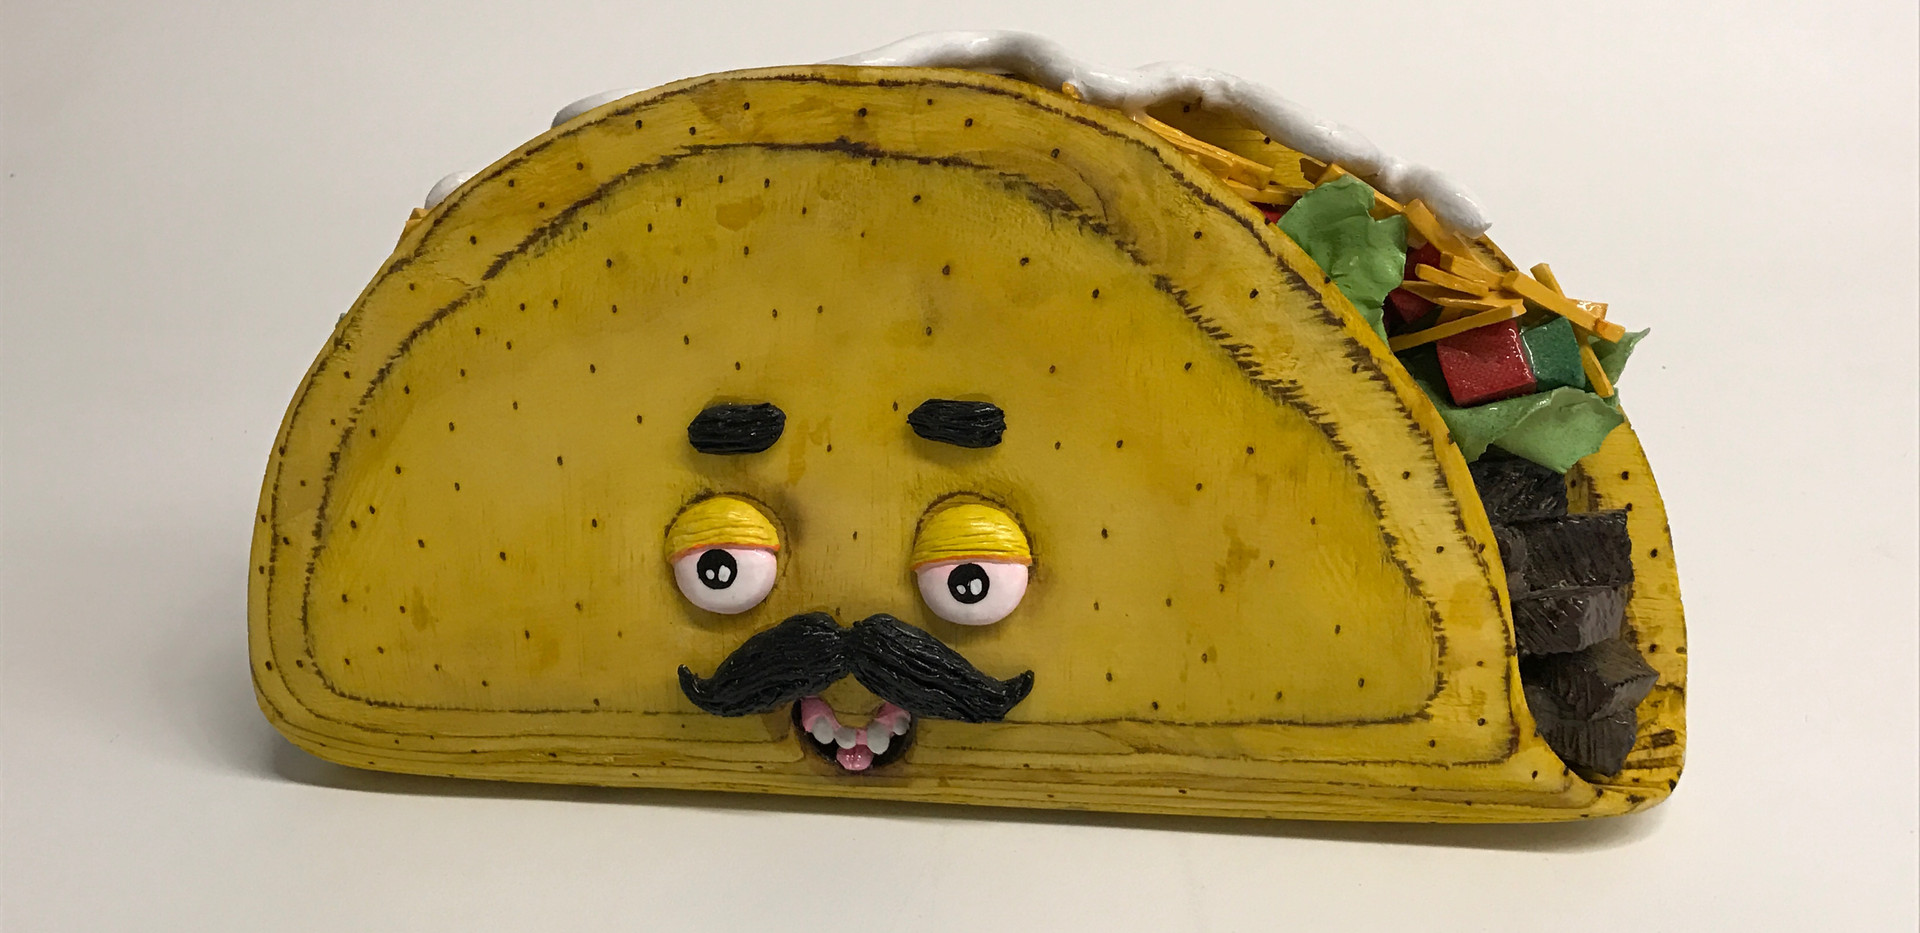 Taco Friend (2017)